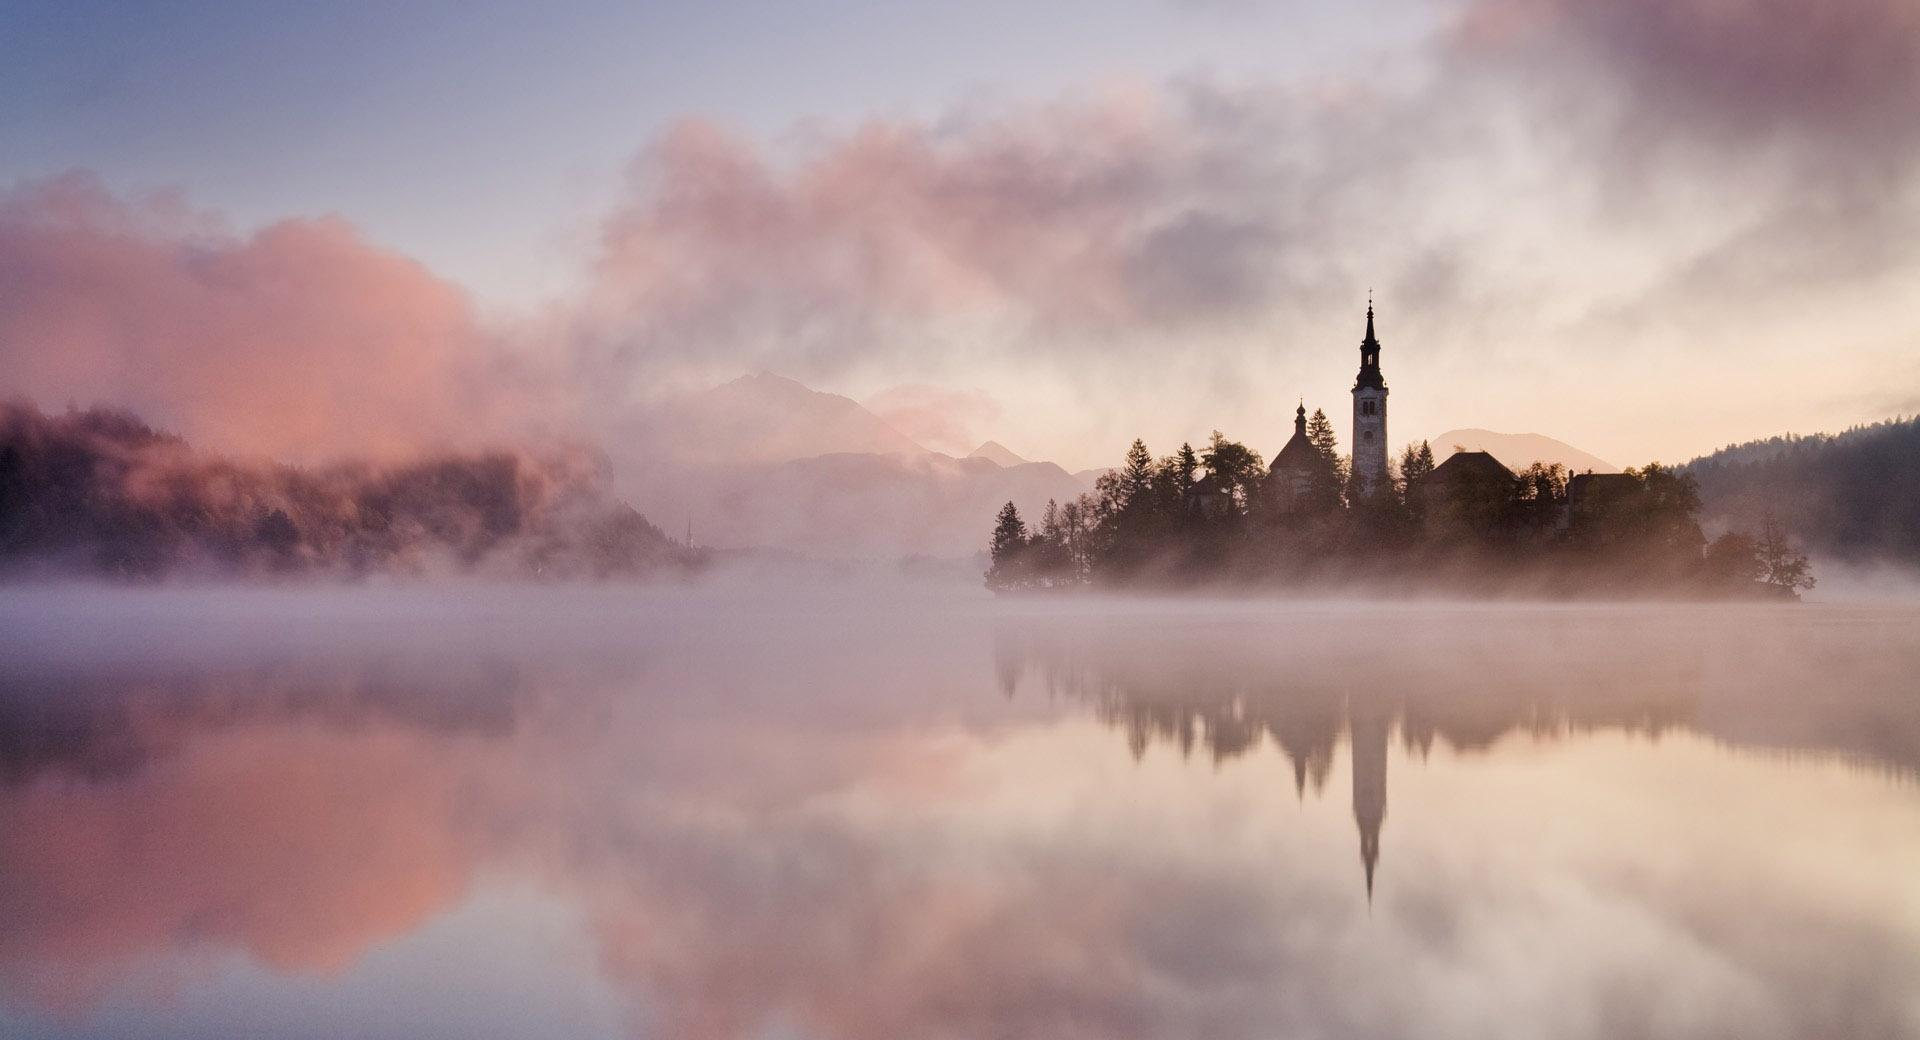 Lake Fog wallpapers HD quality